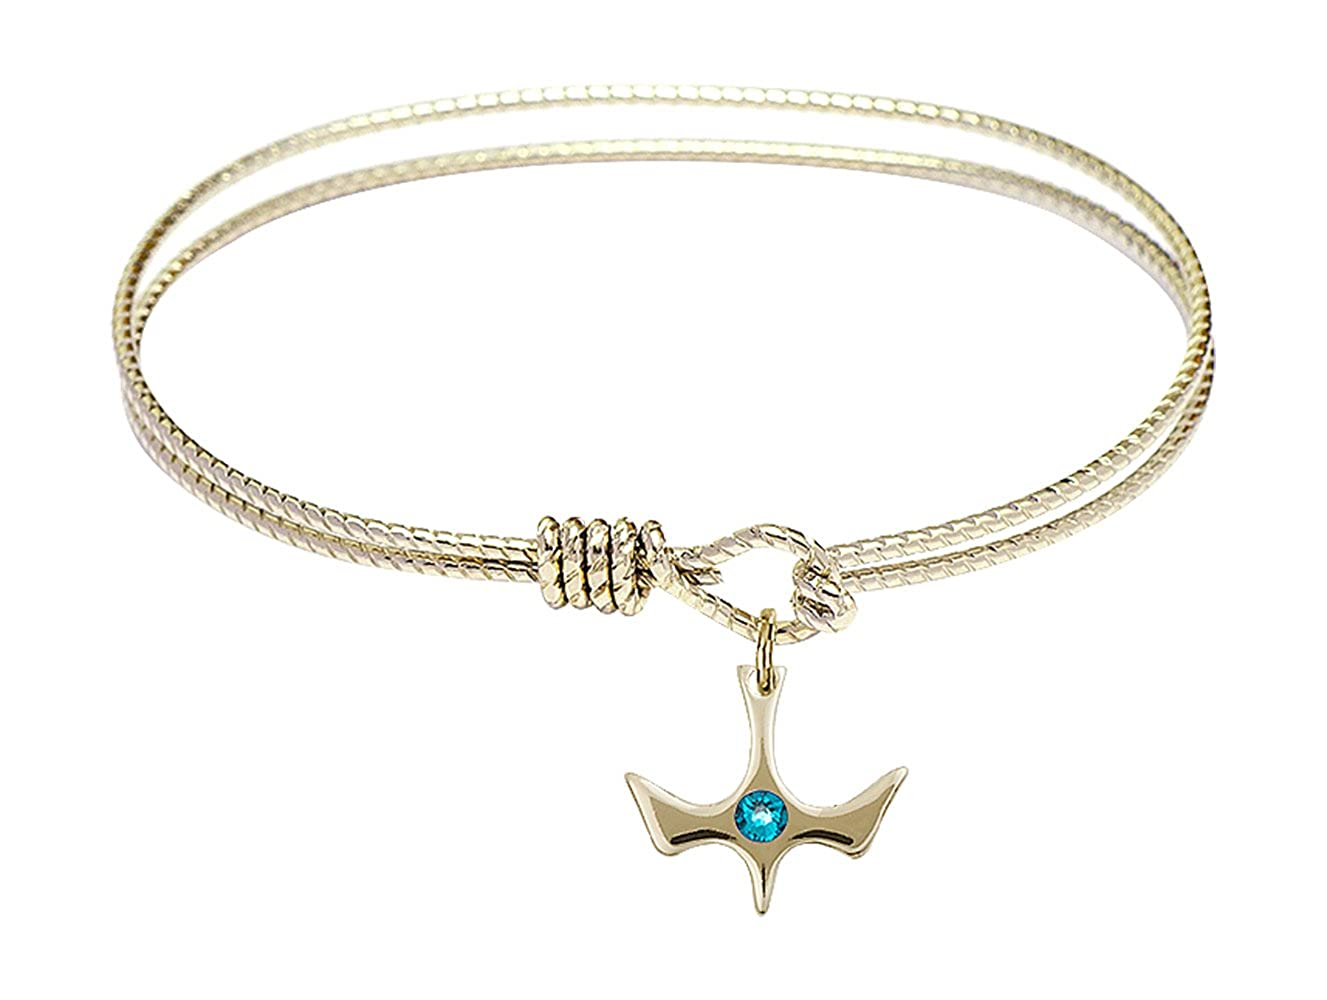 DiamondJewelryNY Eye Hook Bangle Bracelet with a Holy Spirit Charm.